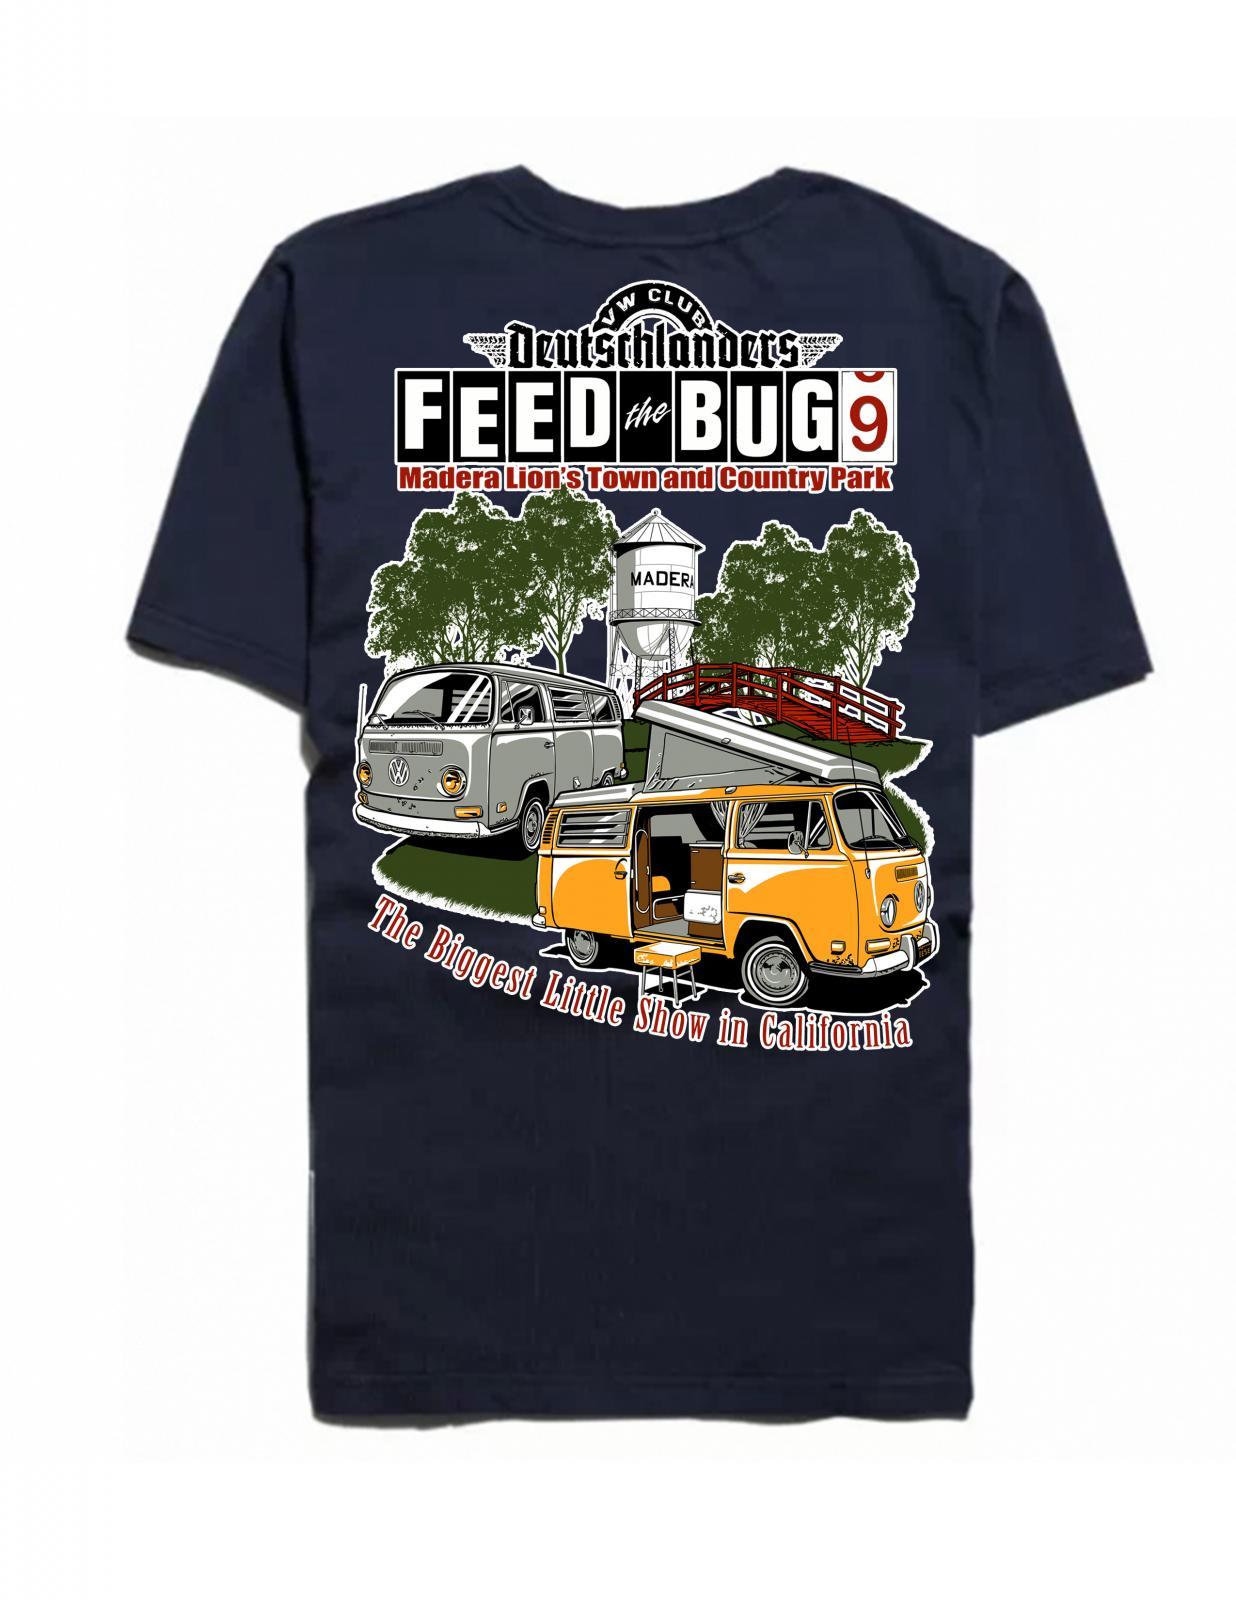 Feed the bug 9